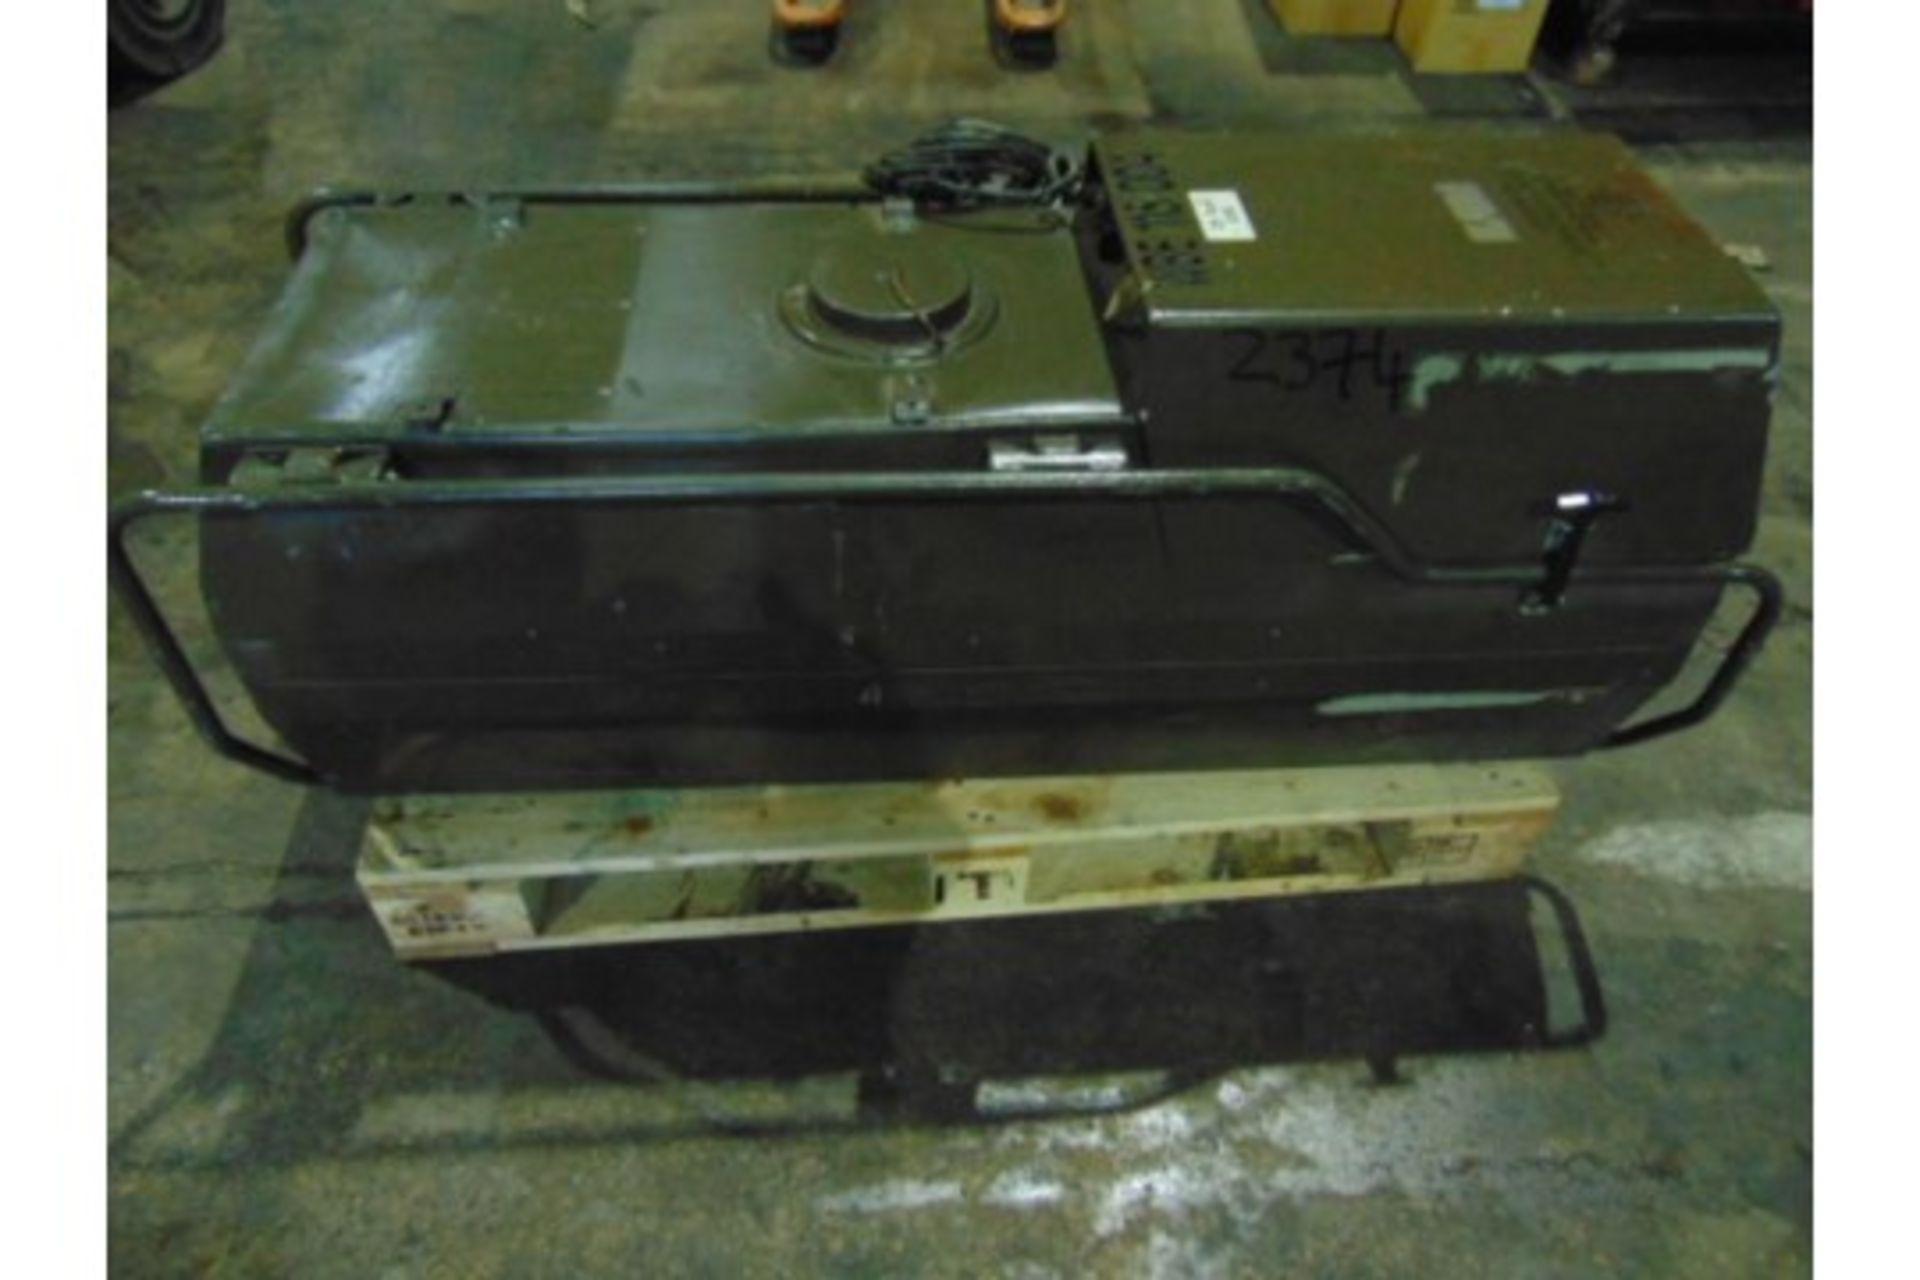 Lot 27217 - Dantherm VA-M 15 Mobile Workshop Heater